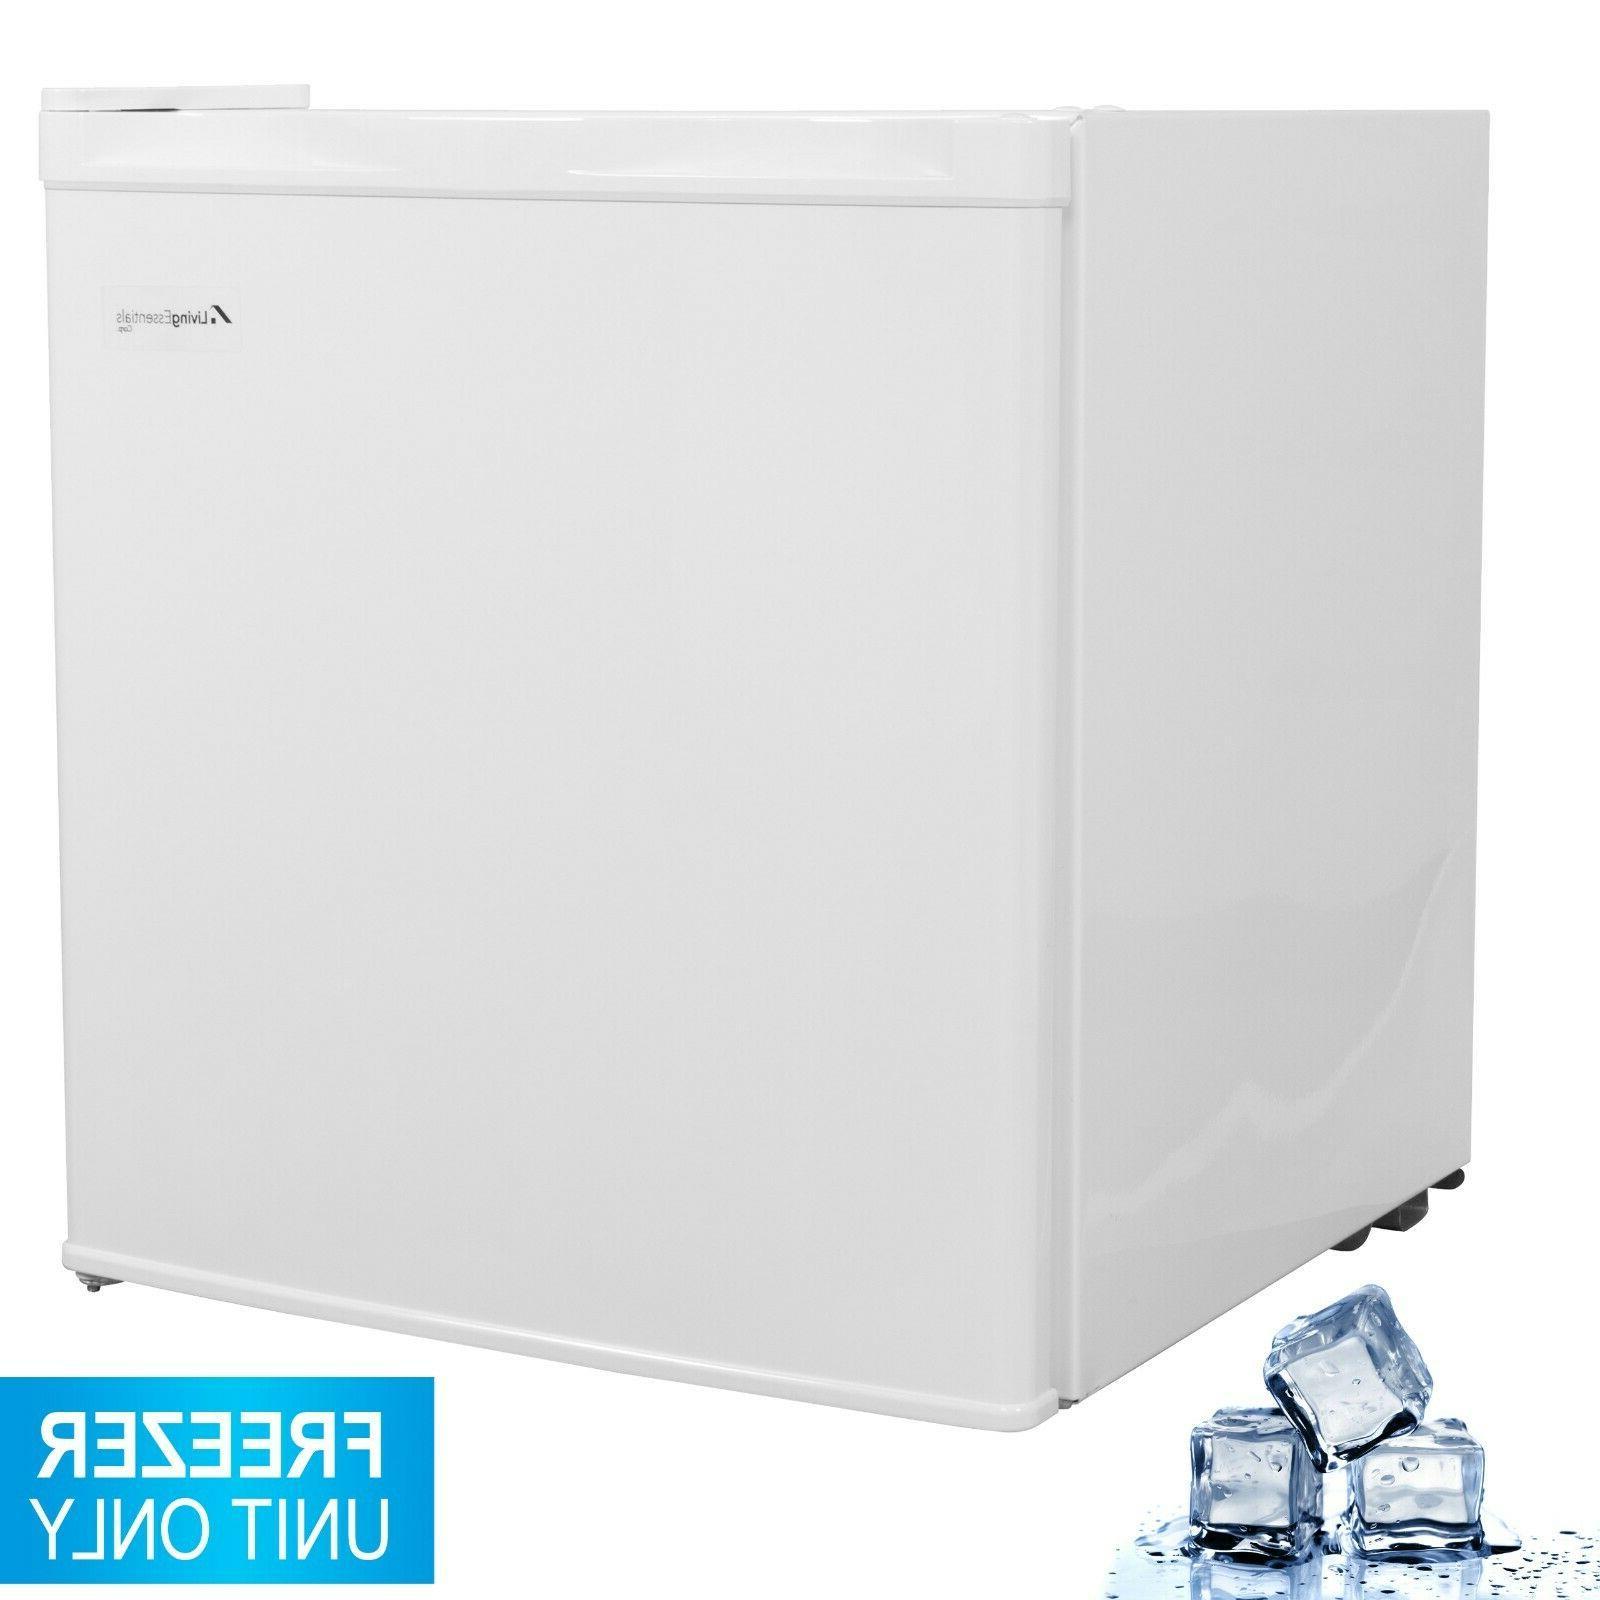 mini freezer efficient silent compact with reversible